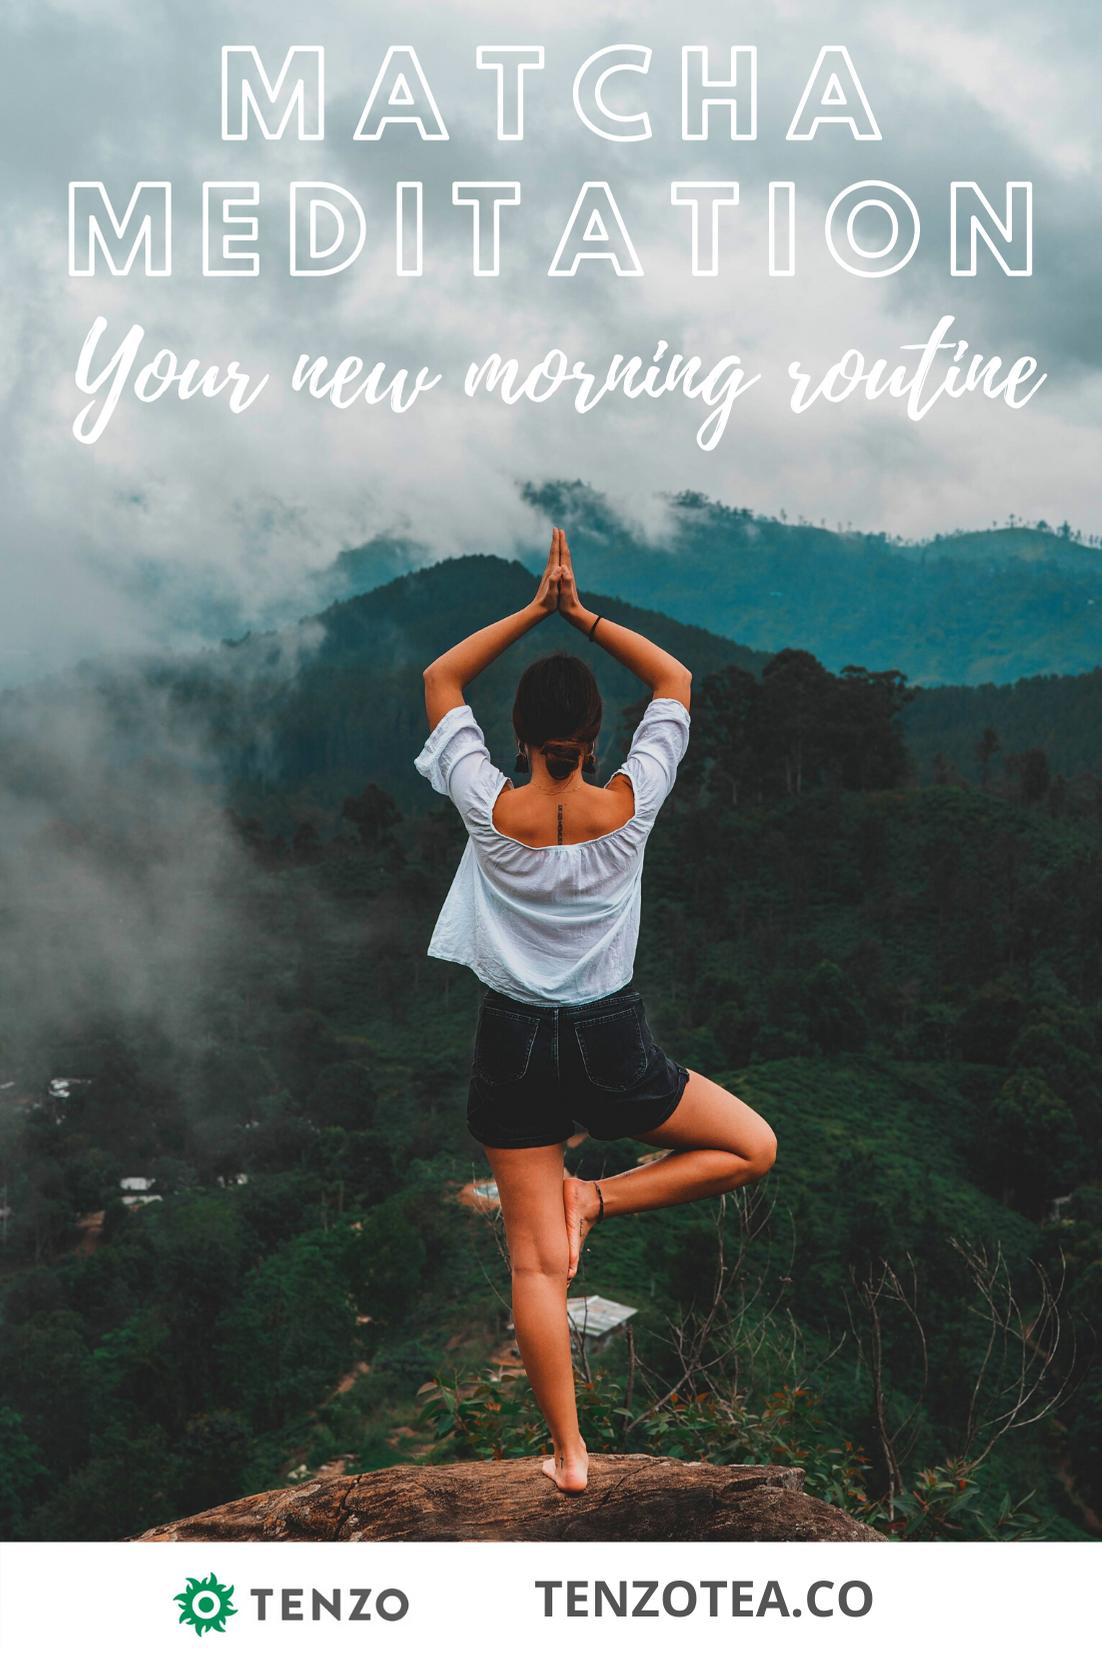 Matcha green tea for a meditative focused morning routine. Everyone is switching! Learn more. | morning yoga routine for energy #matcha #matchalatte #matchaaddict #greentea #latte #iceddrinks #energy #energydrink #health #healthymoms #fitmoms #fitness #energy #focus #workout #yoga #zen #fitmoms #veganmom #vegan #superfood #adaptogens #yummydrinks #workingmom #stayathomemom #meditation #mindfulness #plantbased #healthydrinks #caffeine #coffeesubstitute